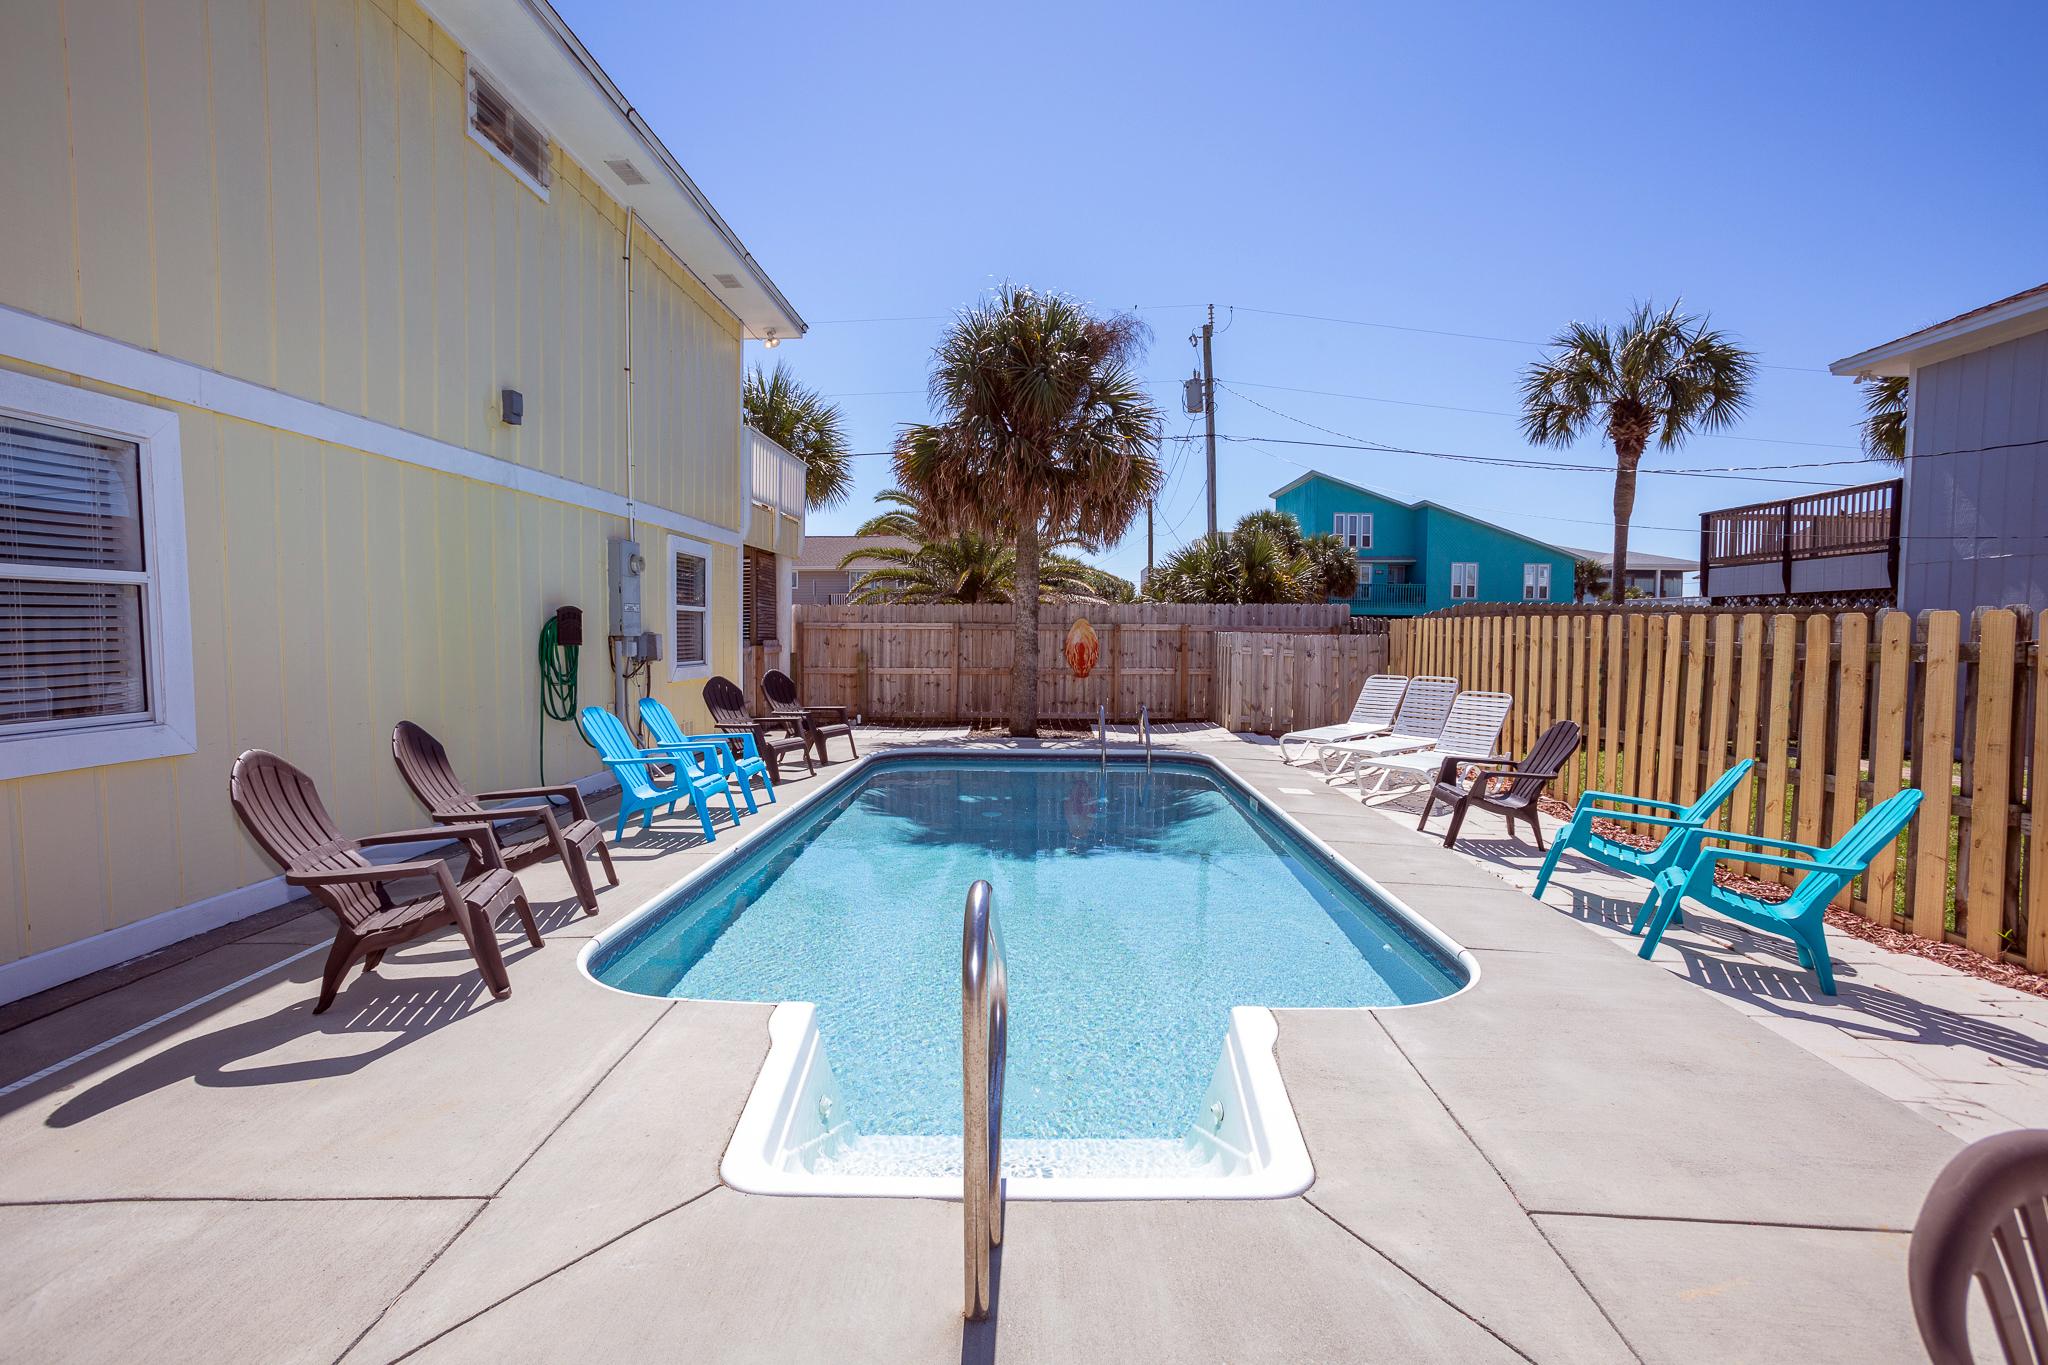 Maldonado 1015 - Sea the Big Picture House/Cottage rental in Pensacola Beach House Rentals in Pensacola Beach Florida - #42